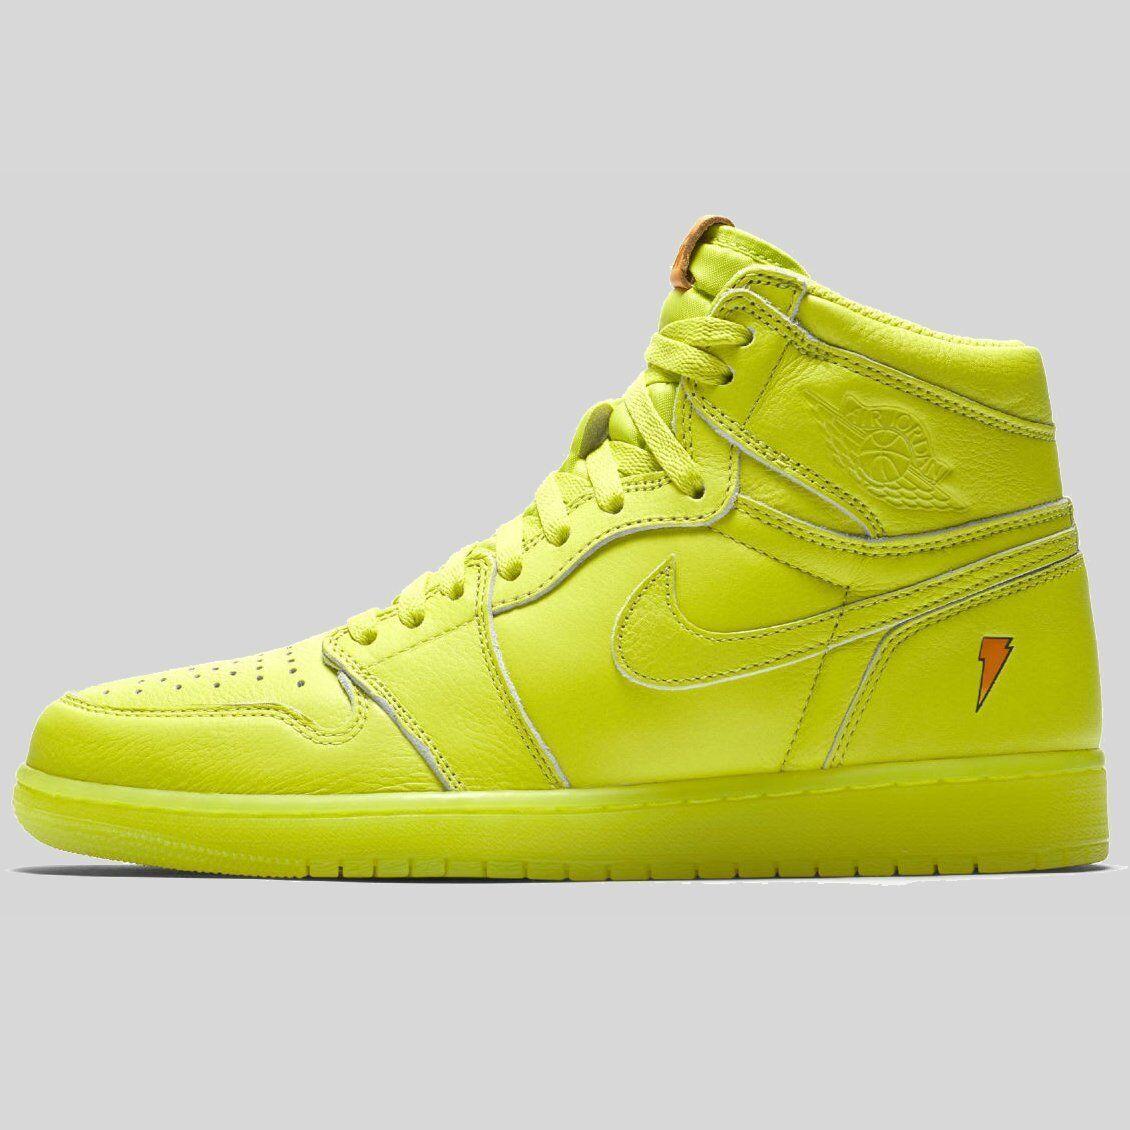 2017 Nike Air Jordan 1 Retro High OG Gatorade Cyber Yellow Size 10. AJ5997-345